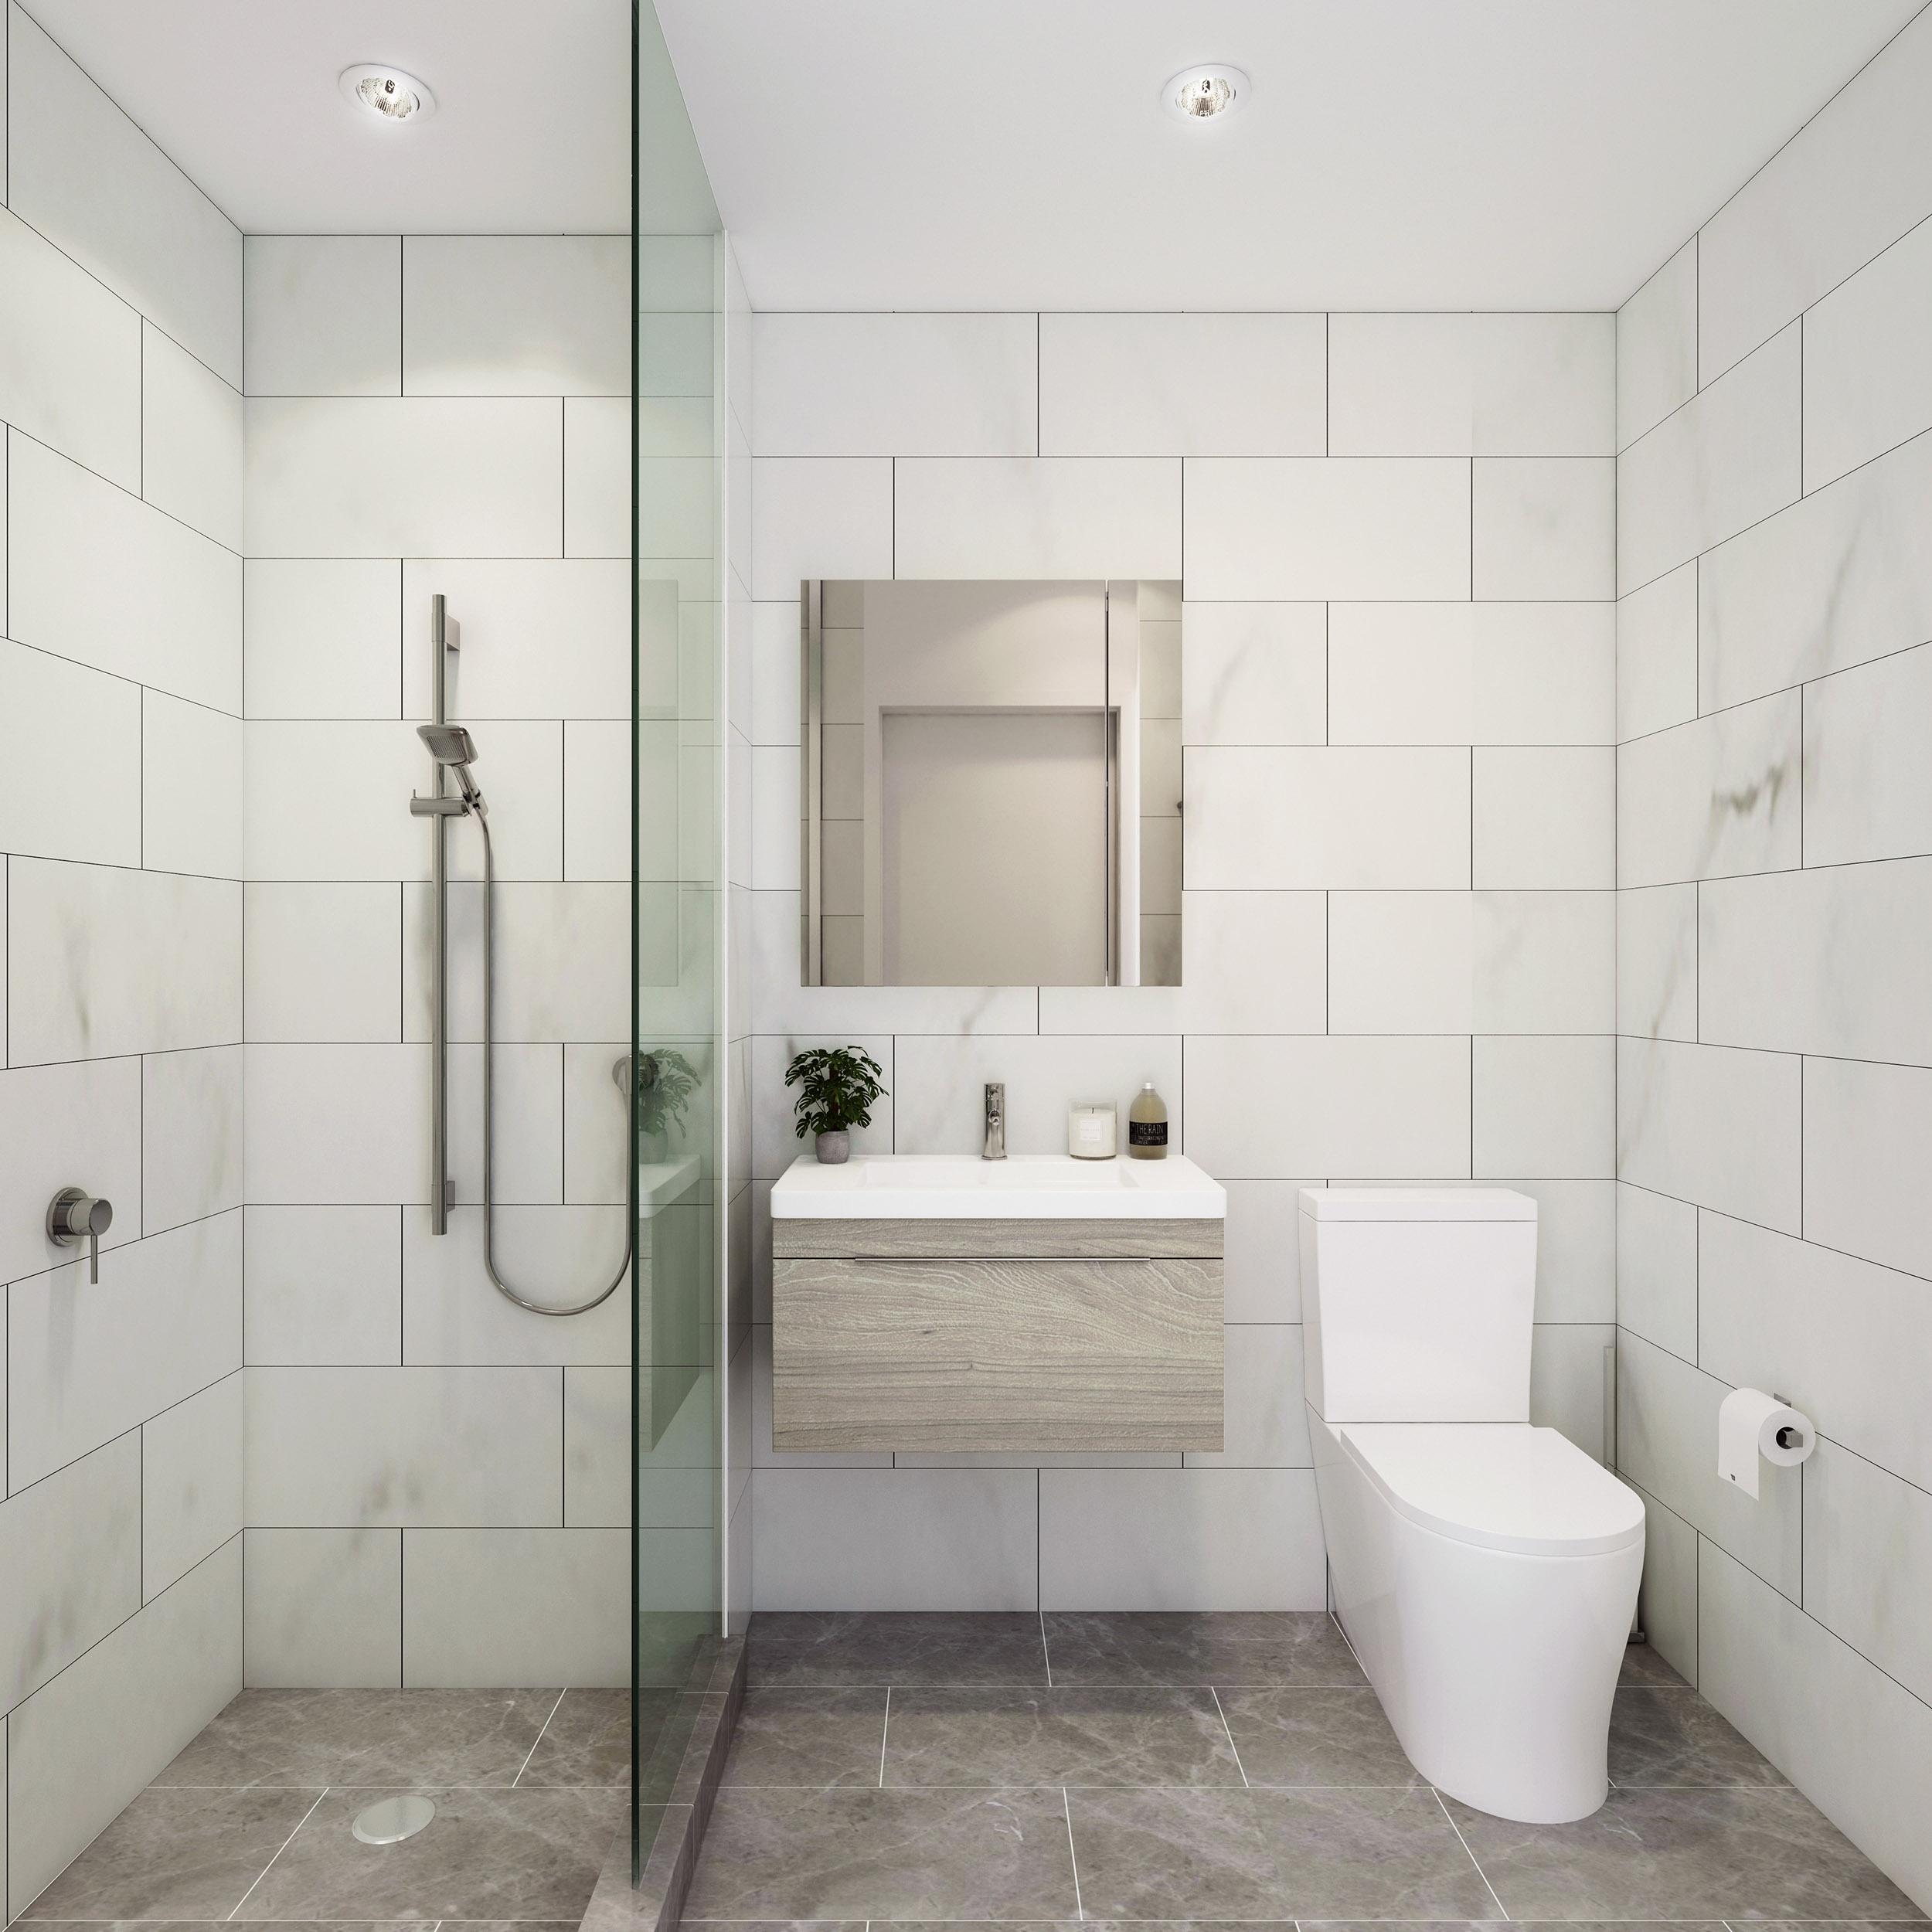 Beachcroft_Int_Bathroom_Final_01_2500px.jpg